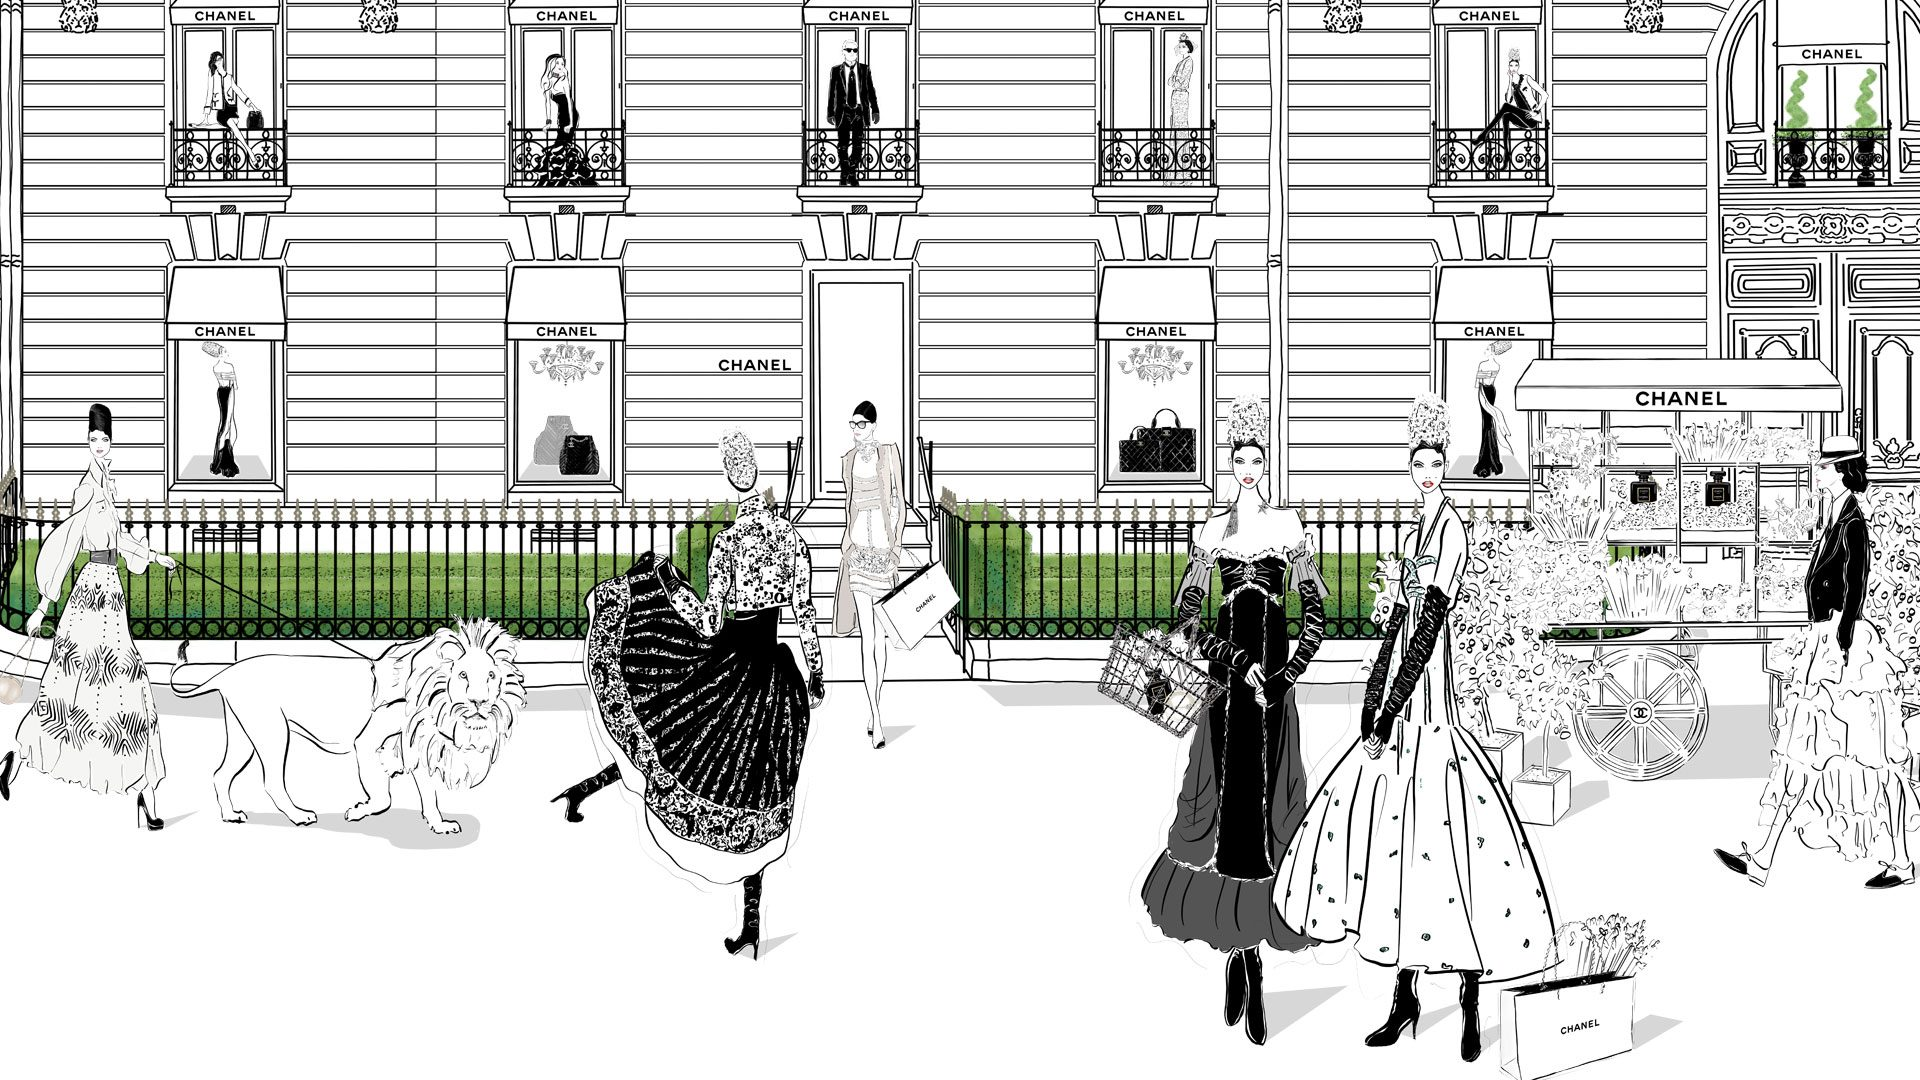 Chanel Paris Fashion Illustration Scene